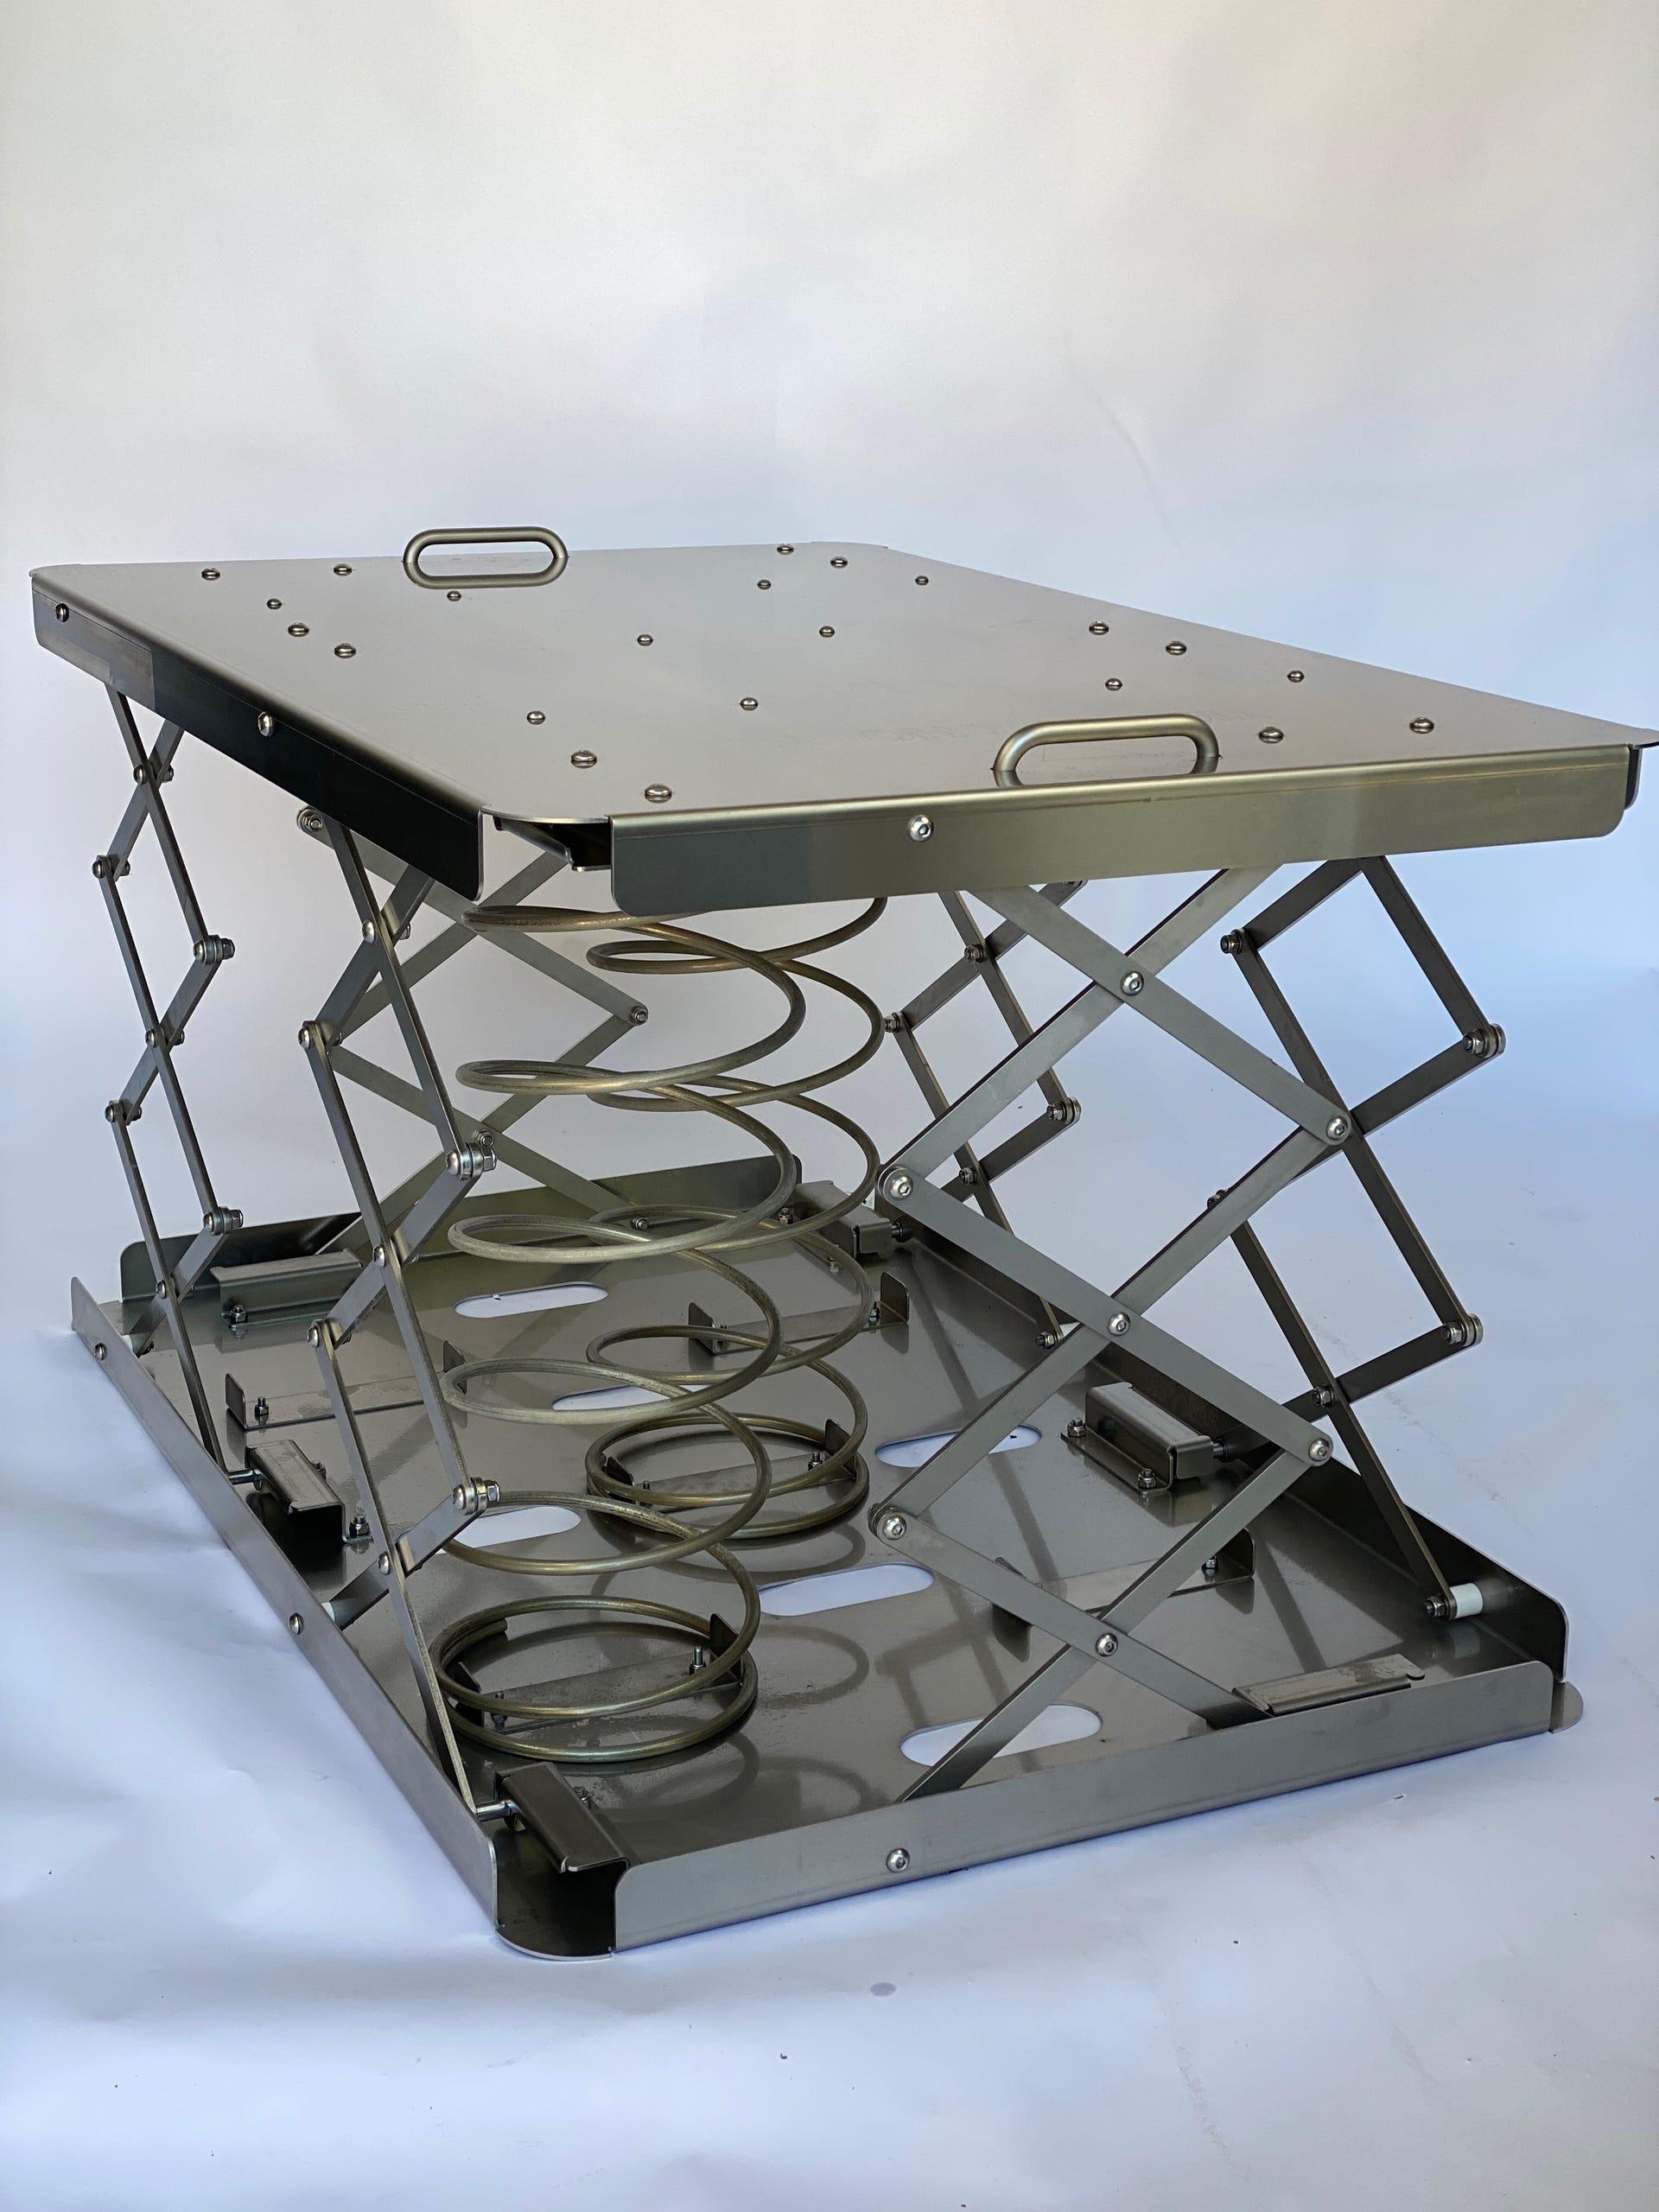 Ergo-BOX Einsatz Federsystem